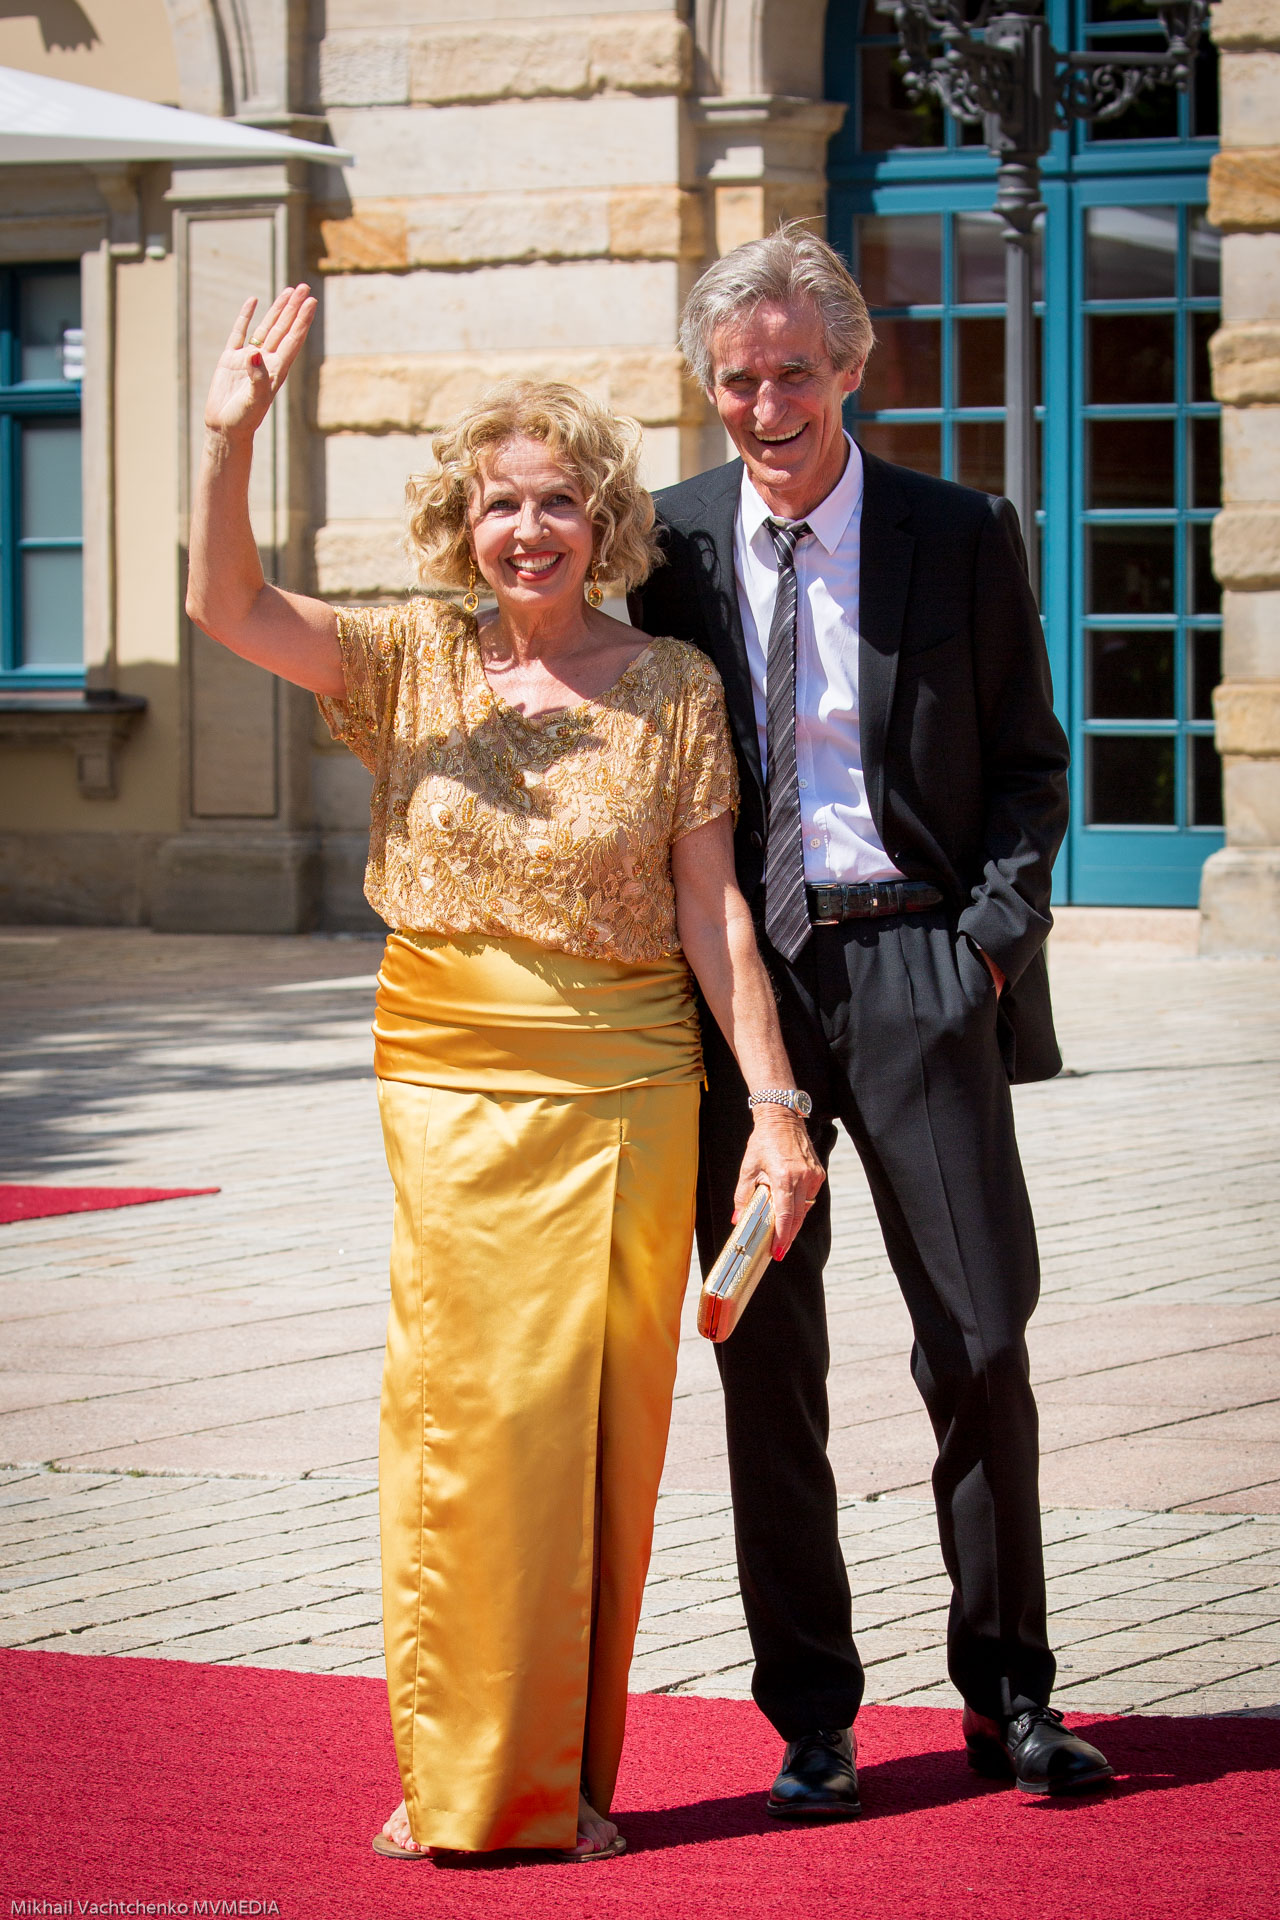 Актриса Микаэла Мэй с супругом Берндом Шадевальд